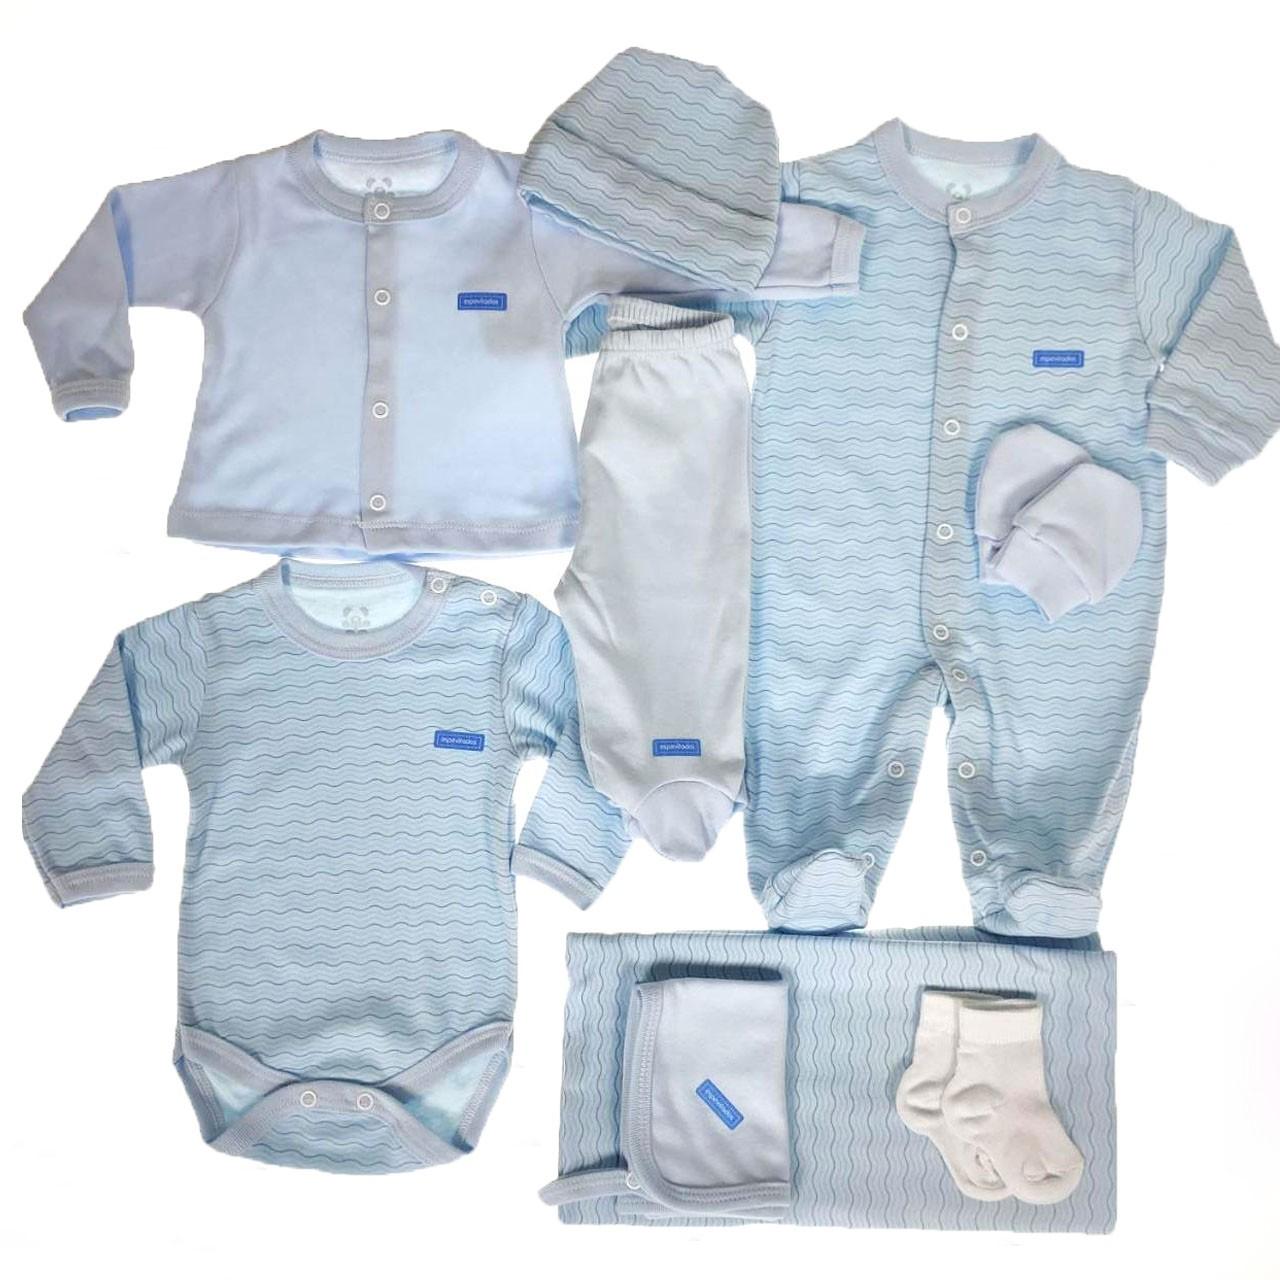 Kit Maternidade Azul Estampa - 9 Peças